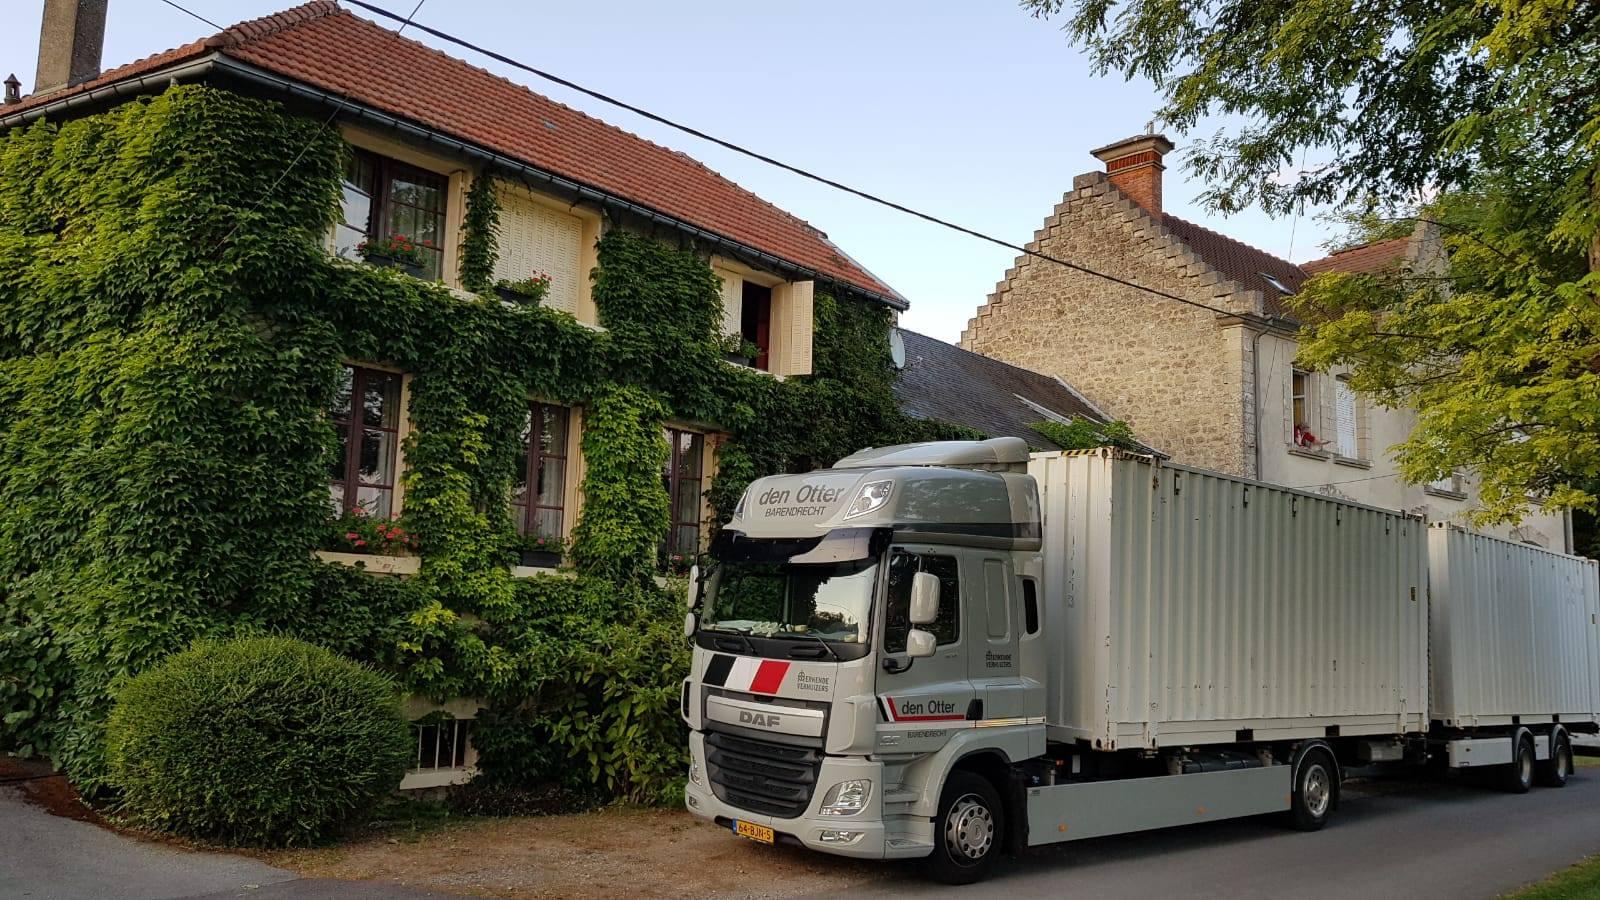 DAF-geladen-in-Frankrijk-gelost-in-Drente-